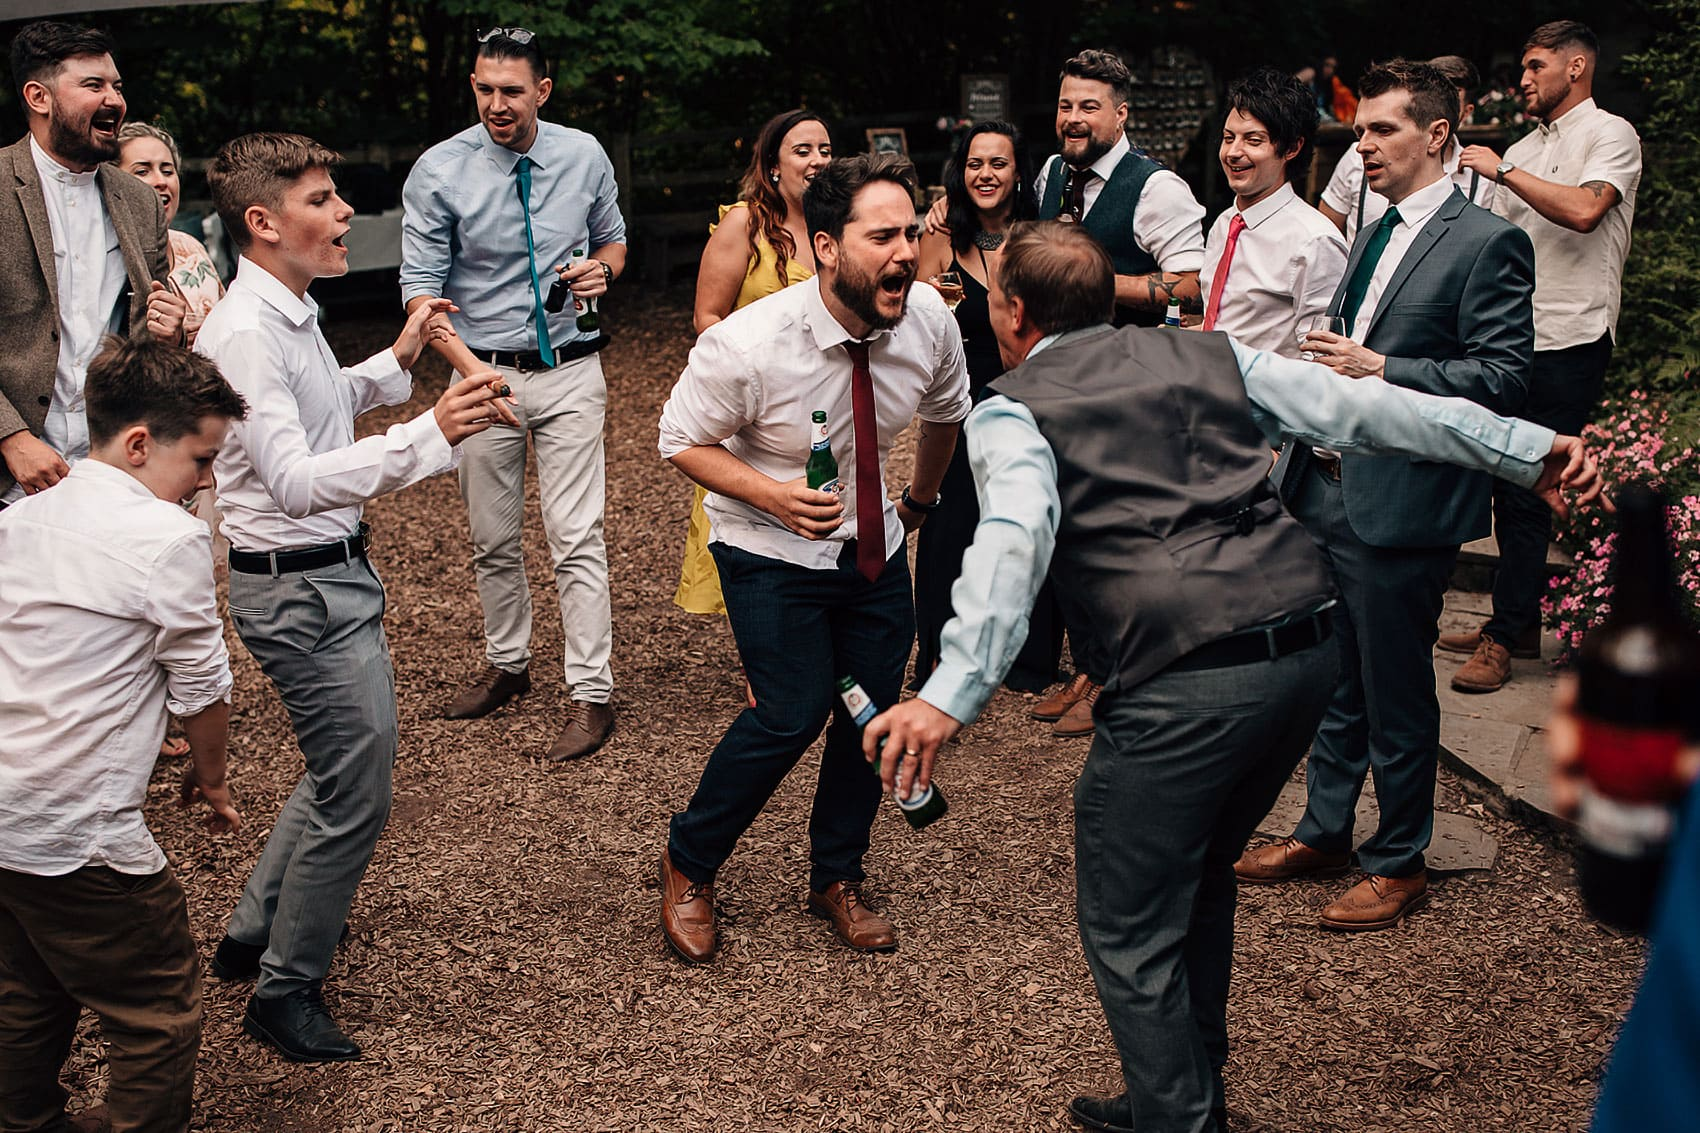 outdoor boho wedding party photography